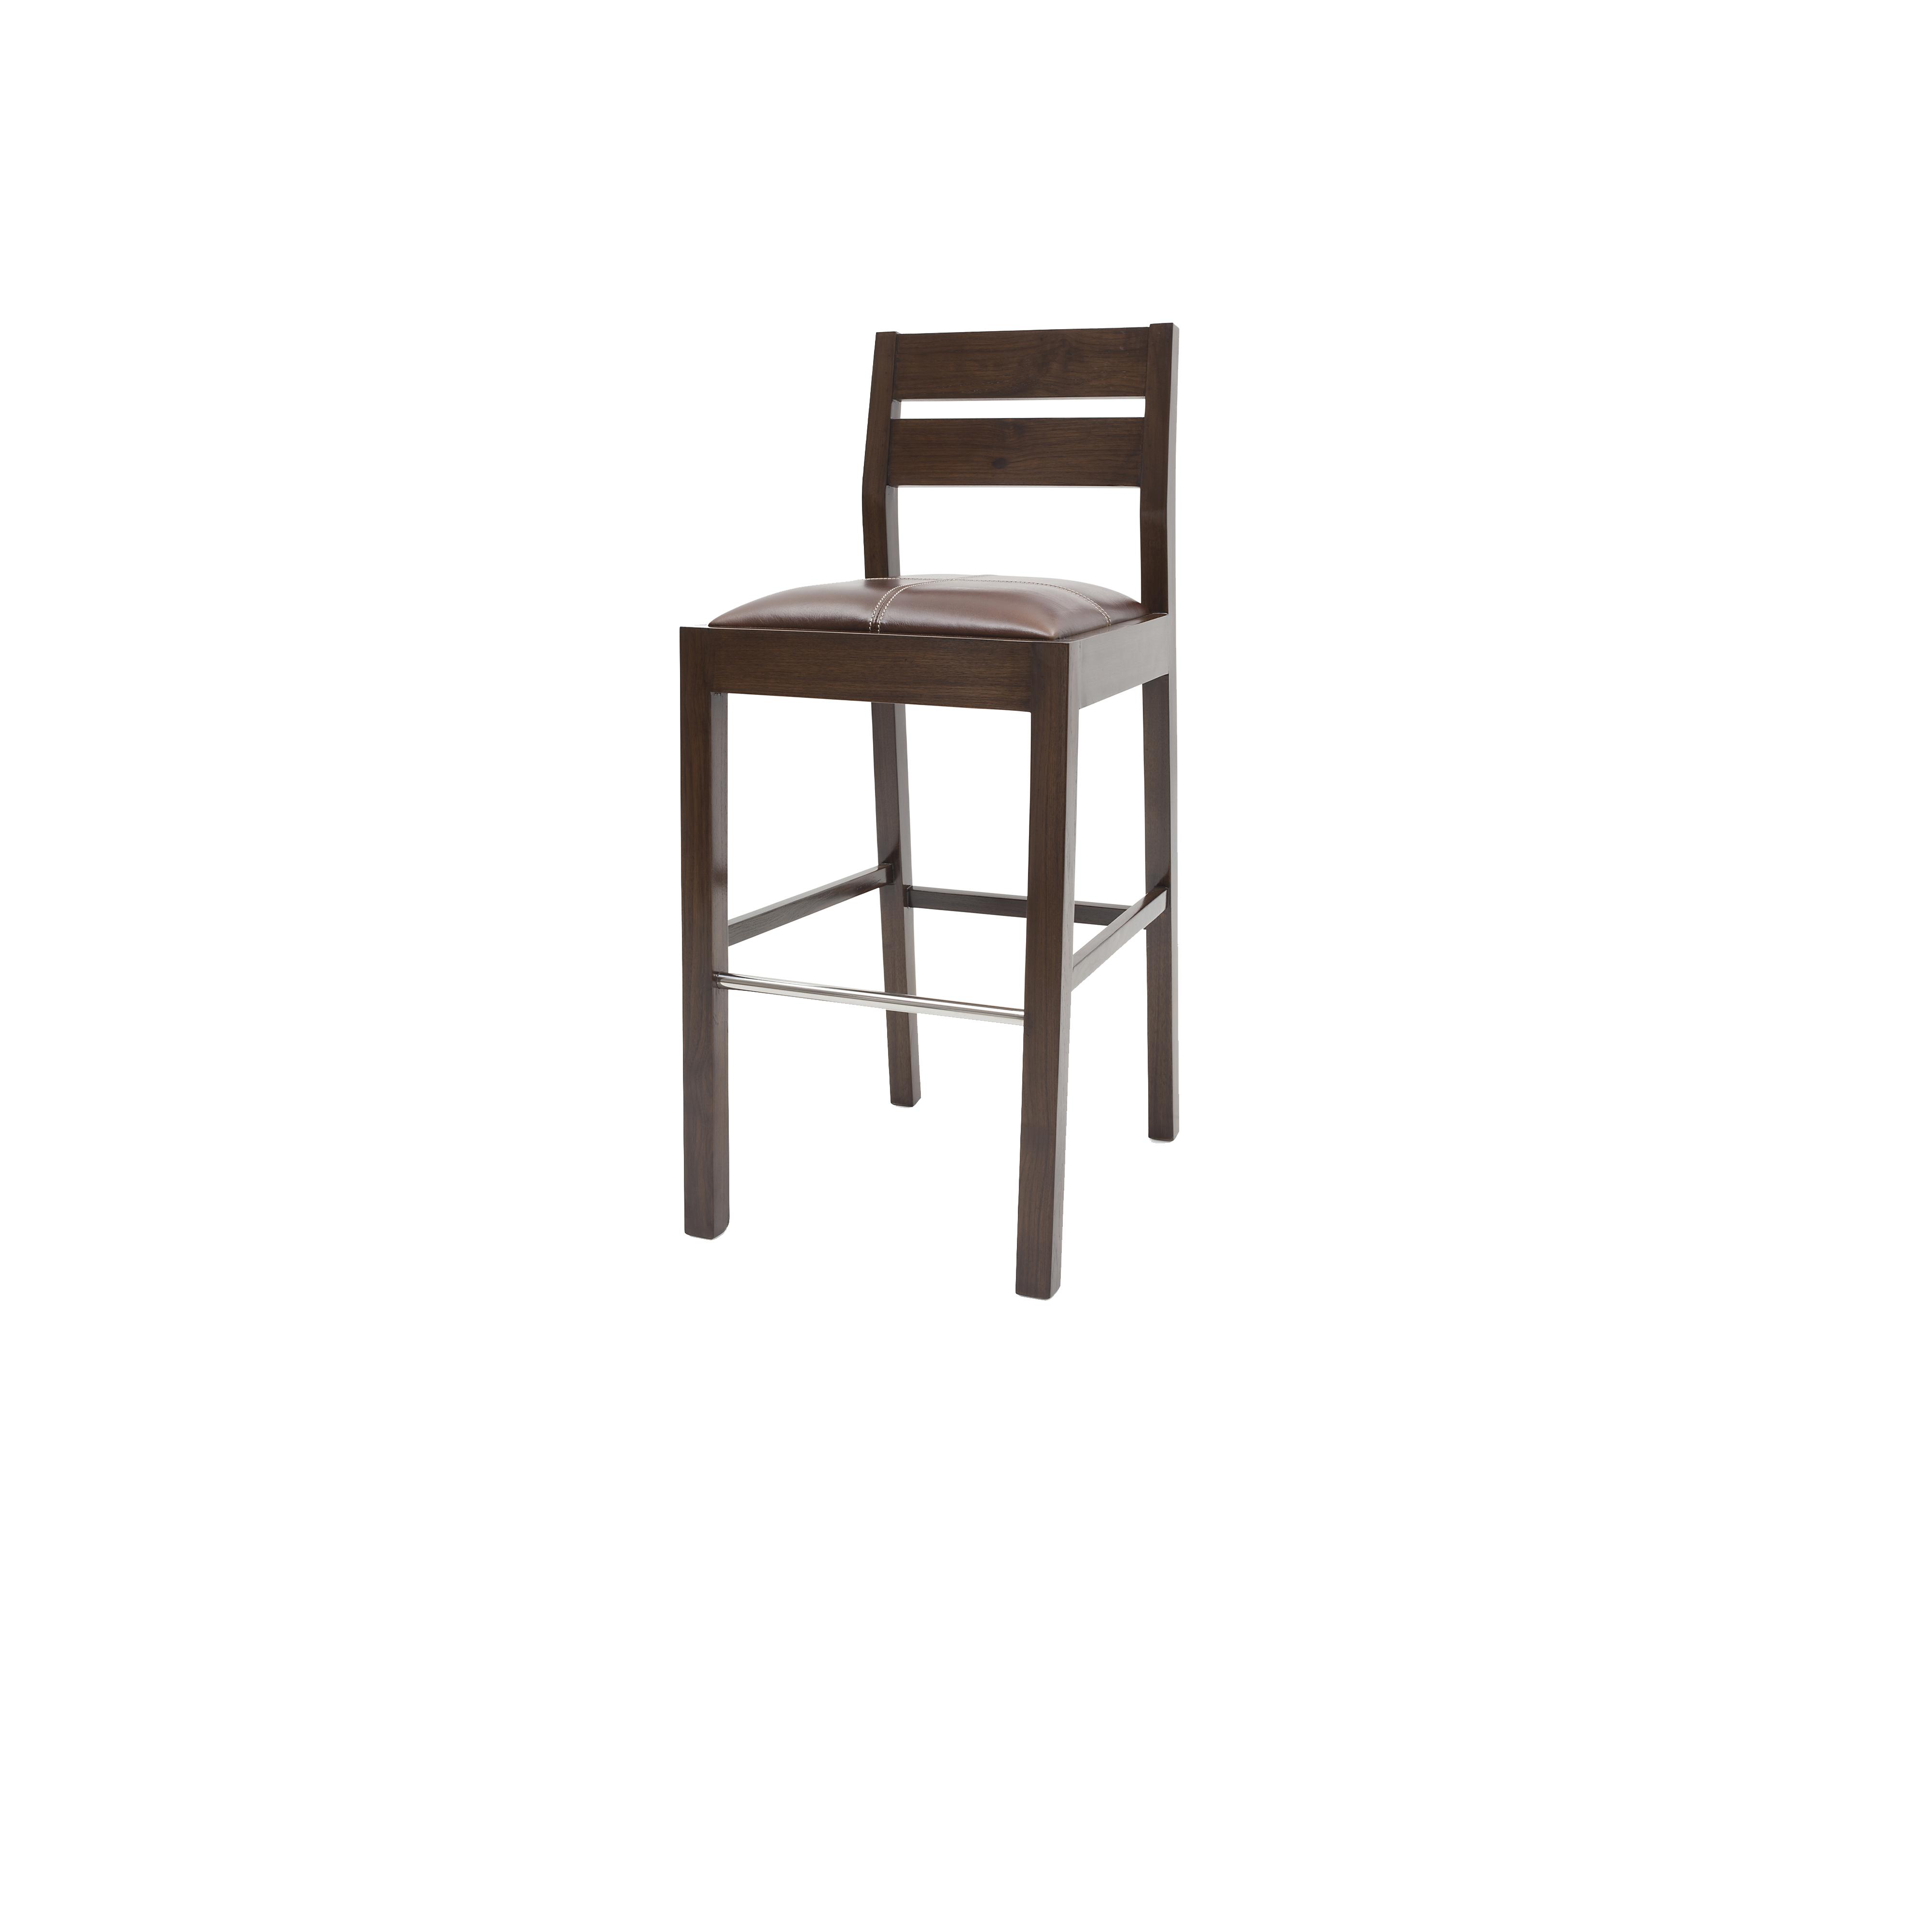 Kinsey bar chair